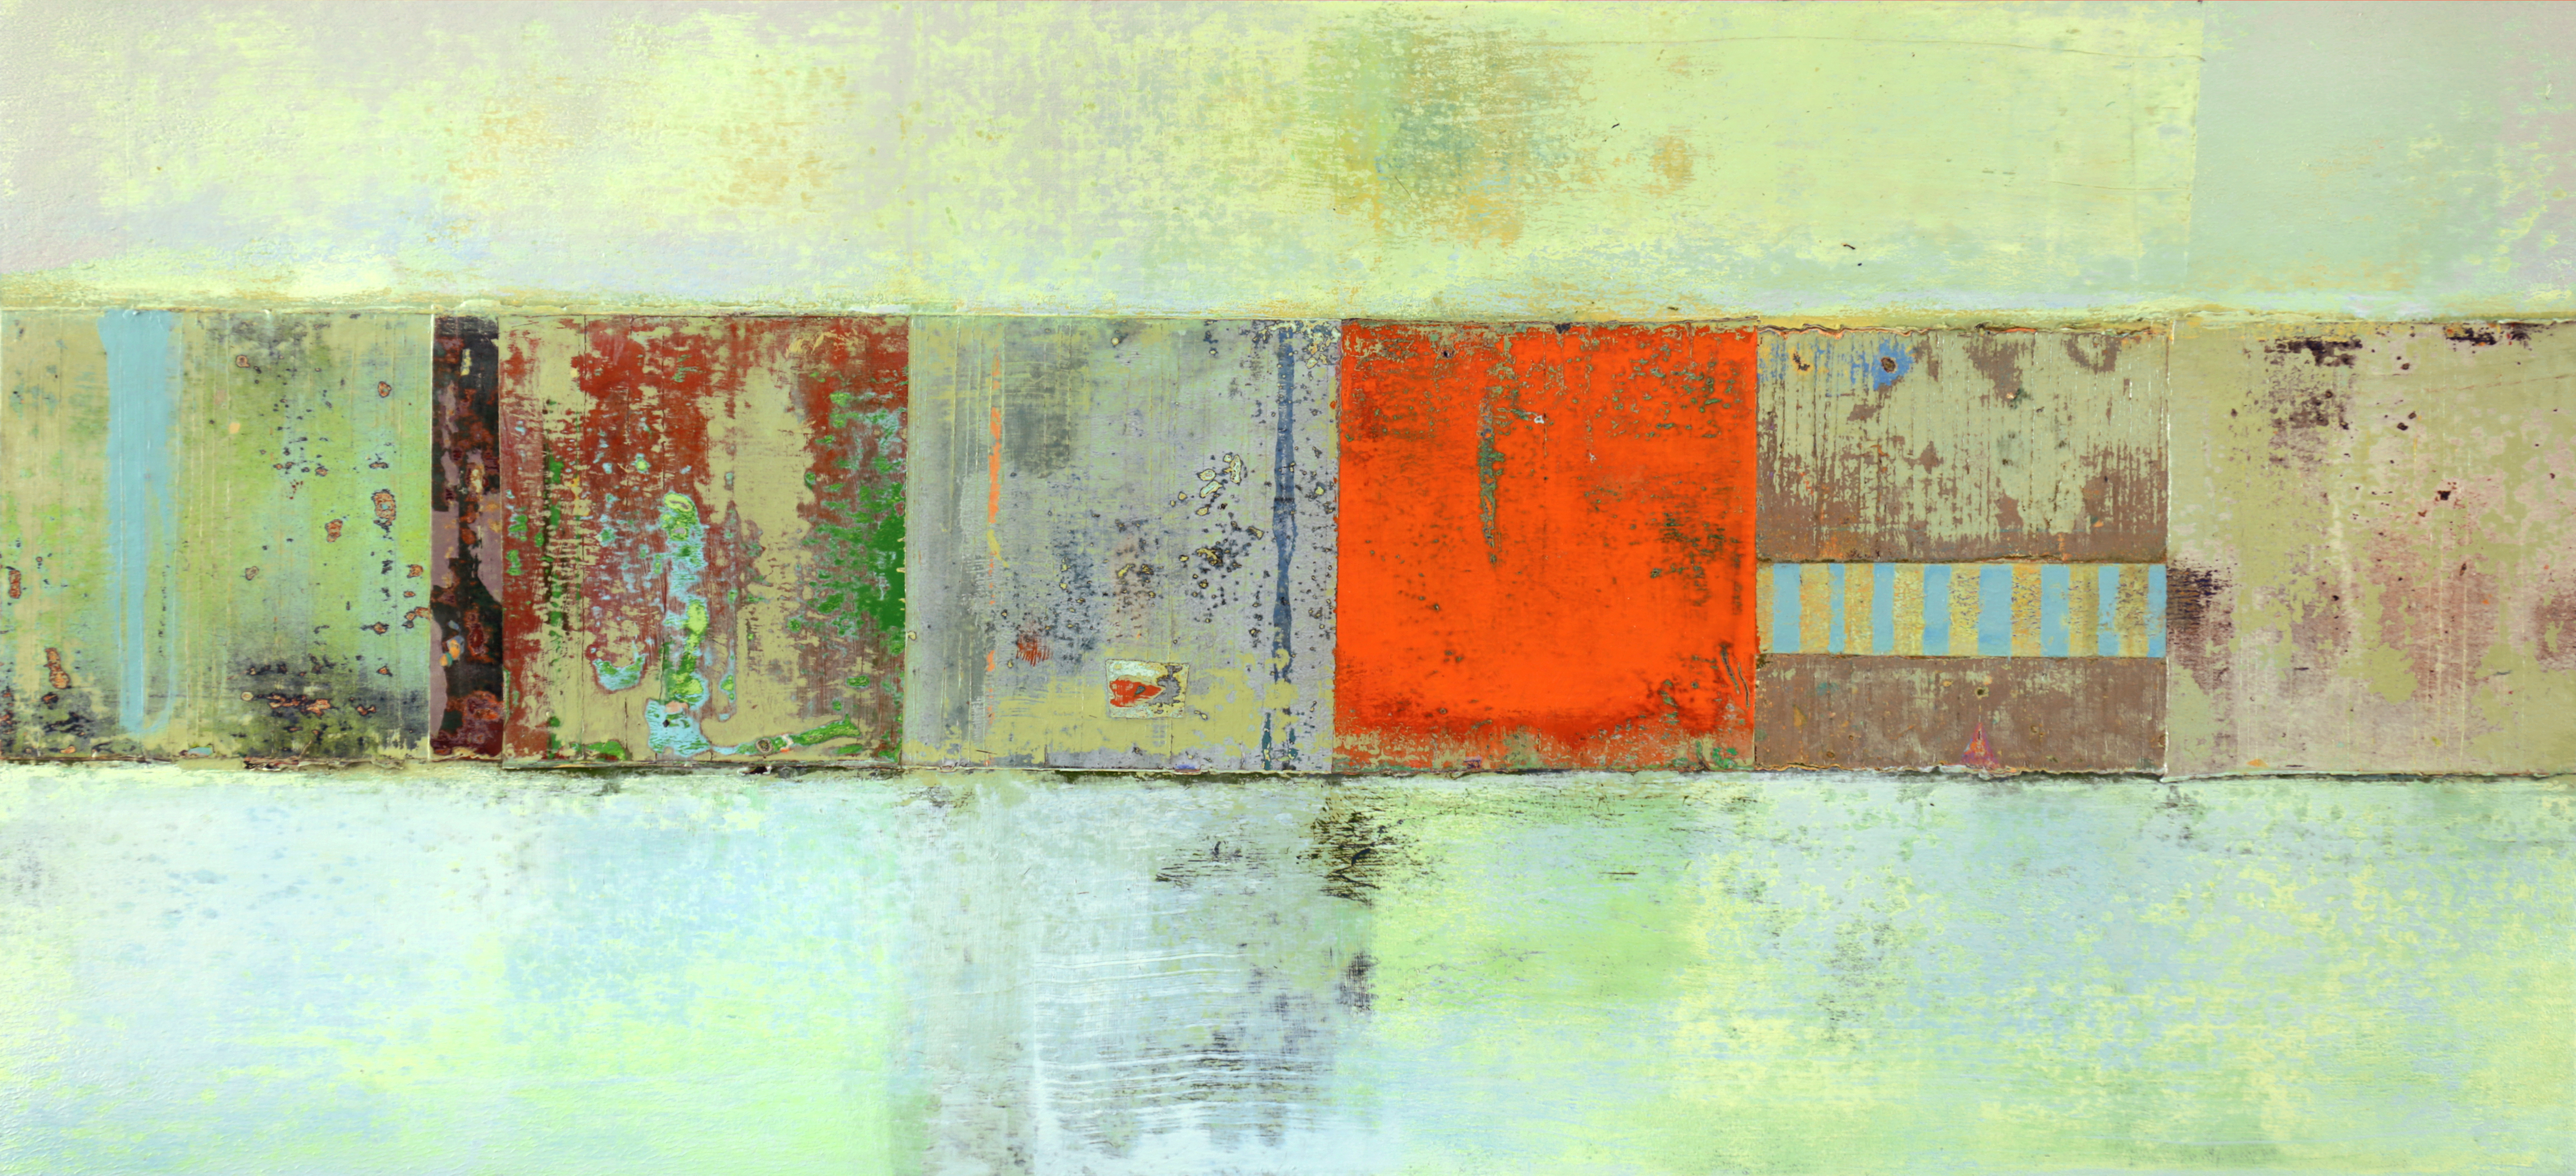 Wanton Composite VII(private collection)